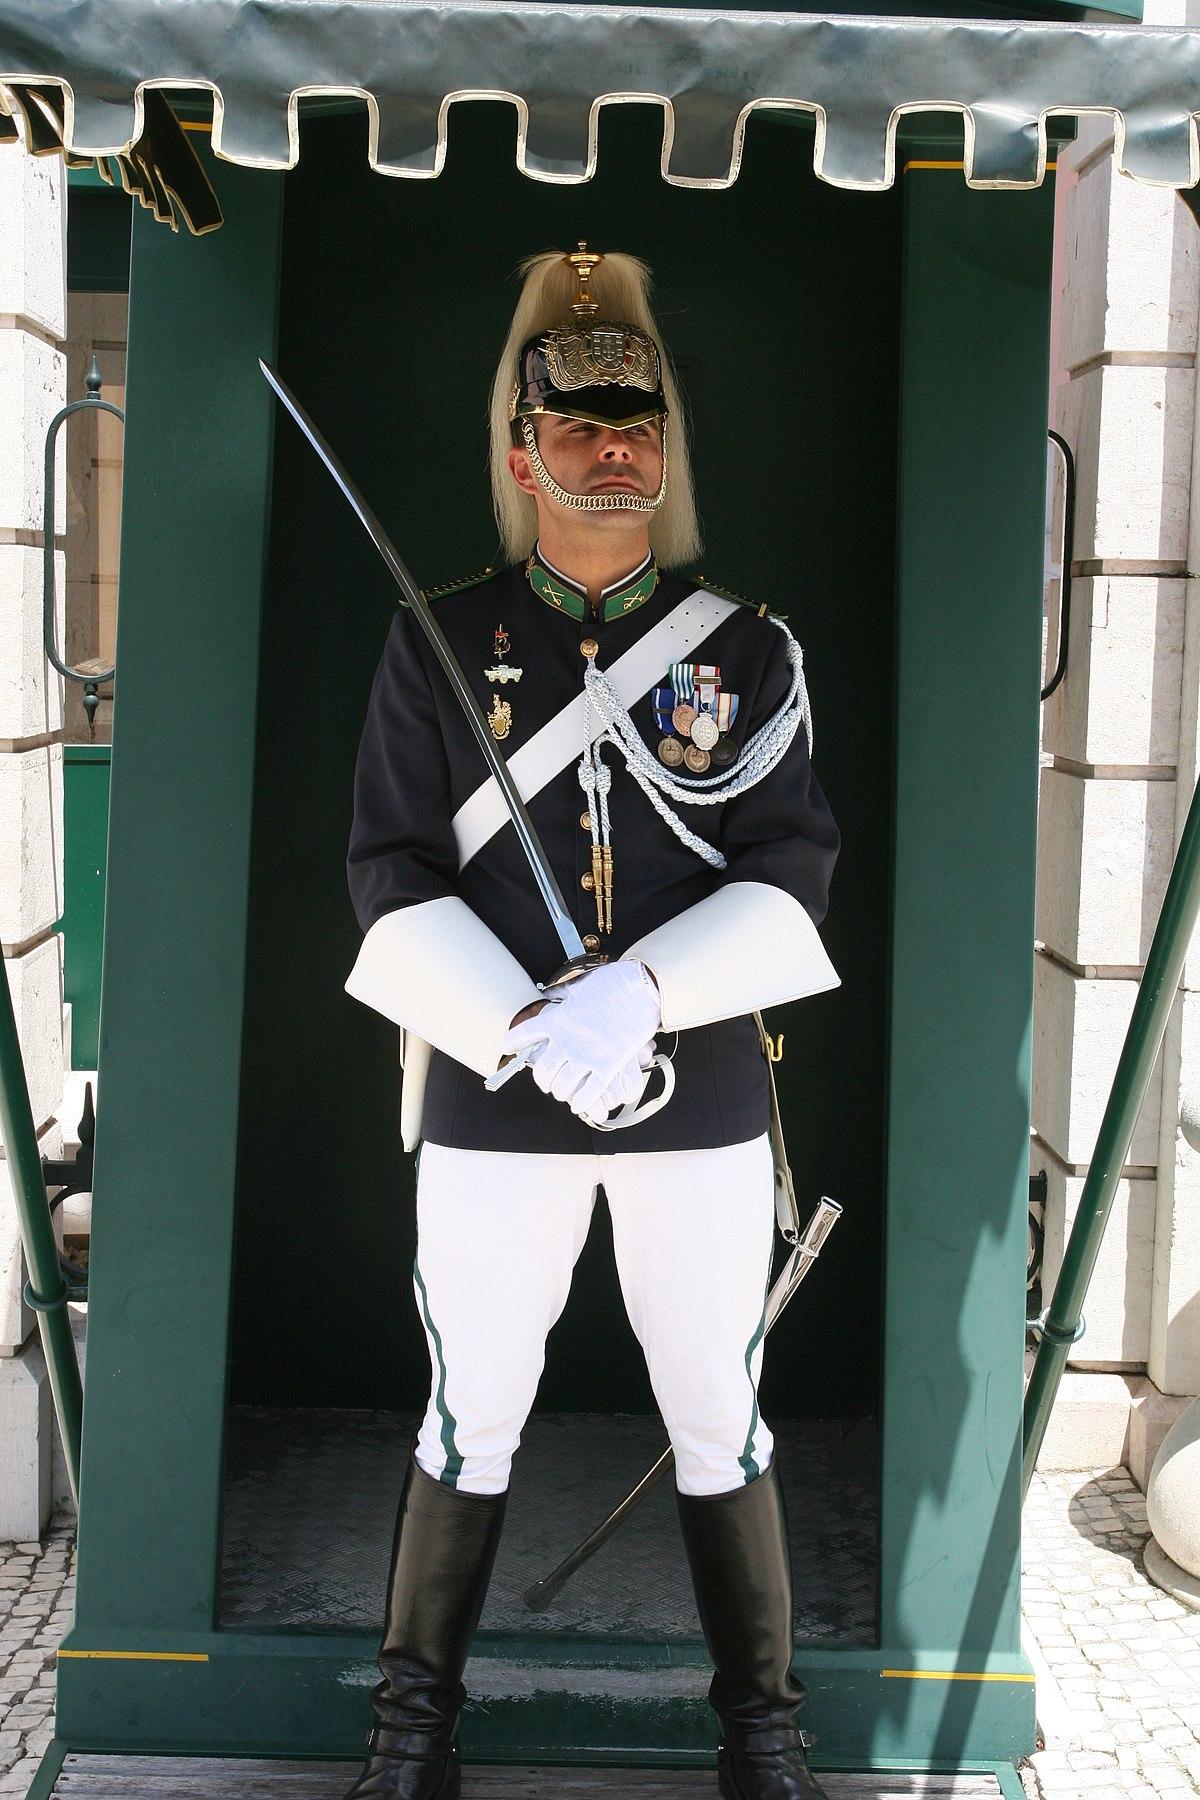 guard - Wiktionary